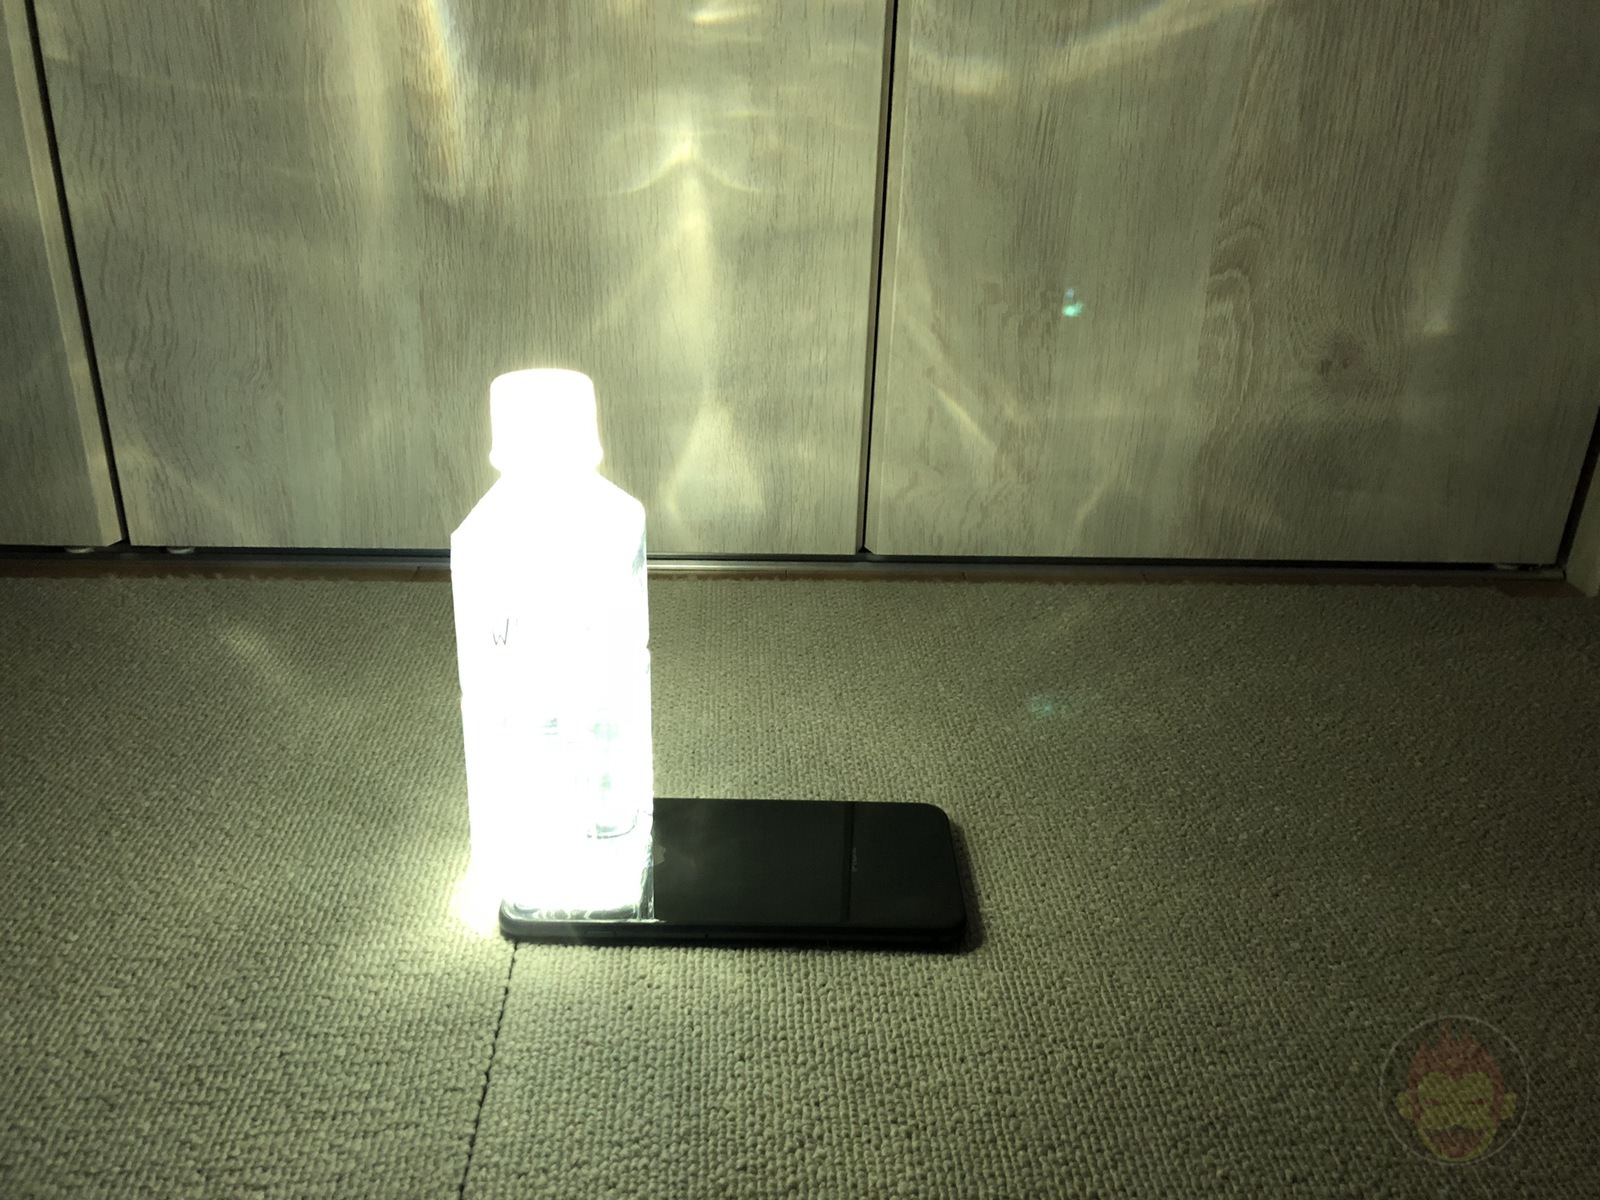 Using-Smartphone-as-Light-01.jpg